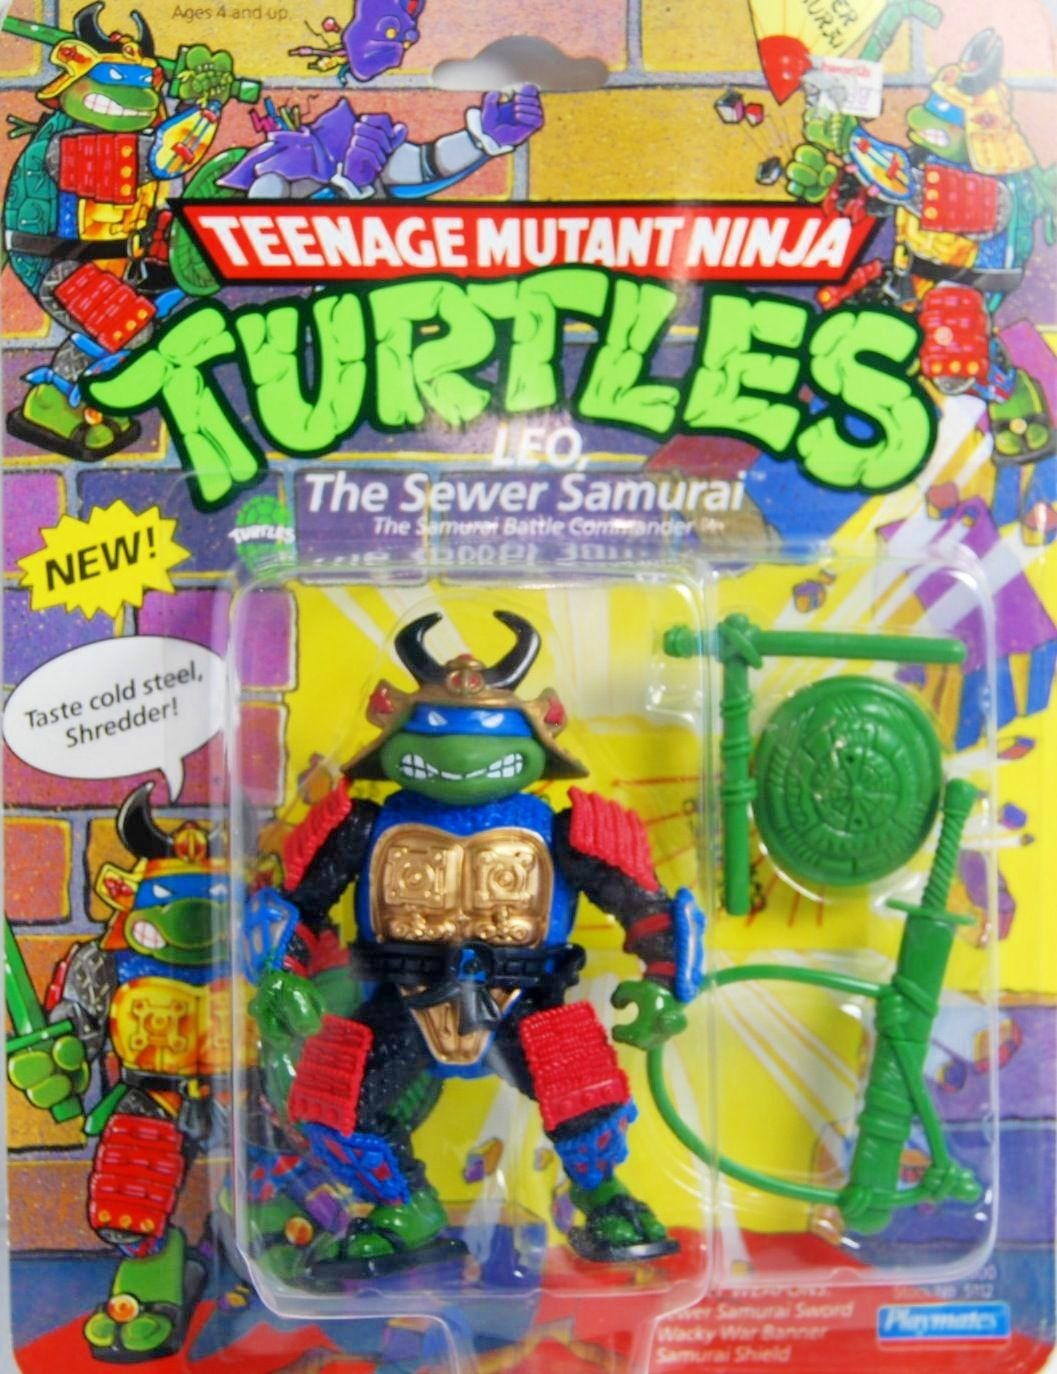 Leo, the Sewer Samurai (1990 action figure)